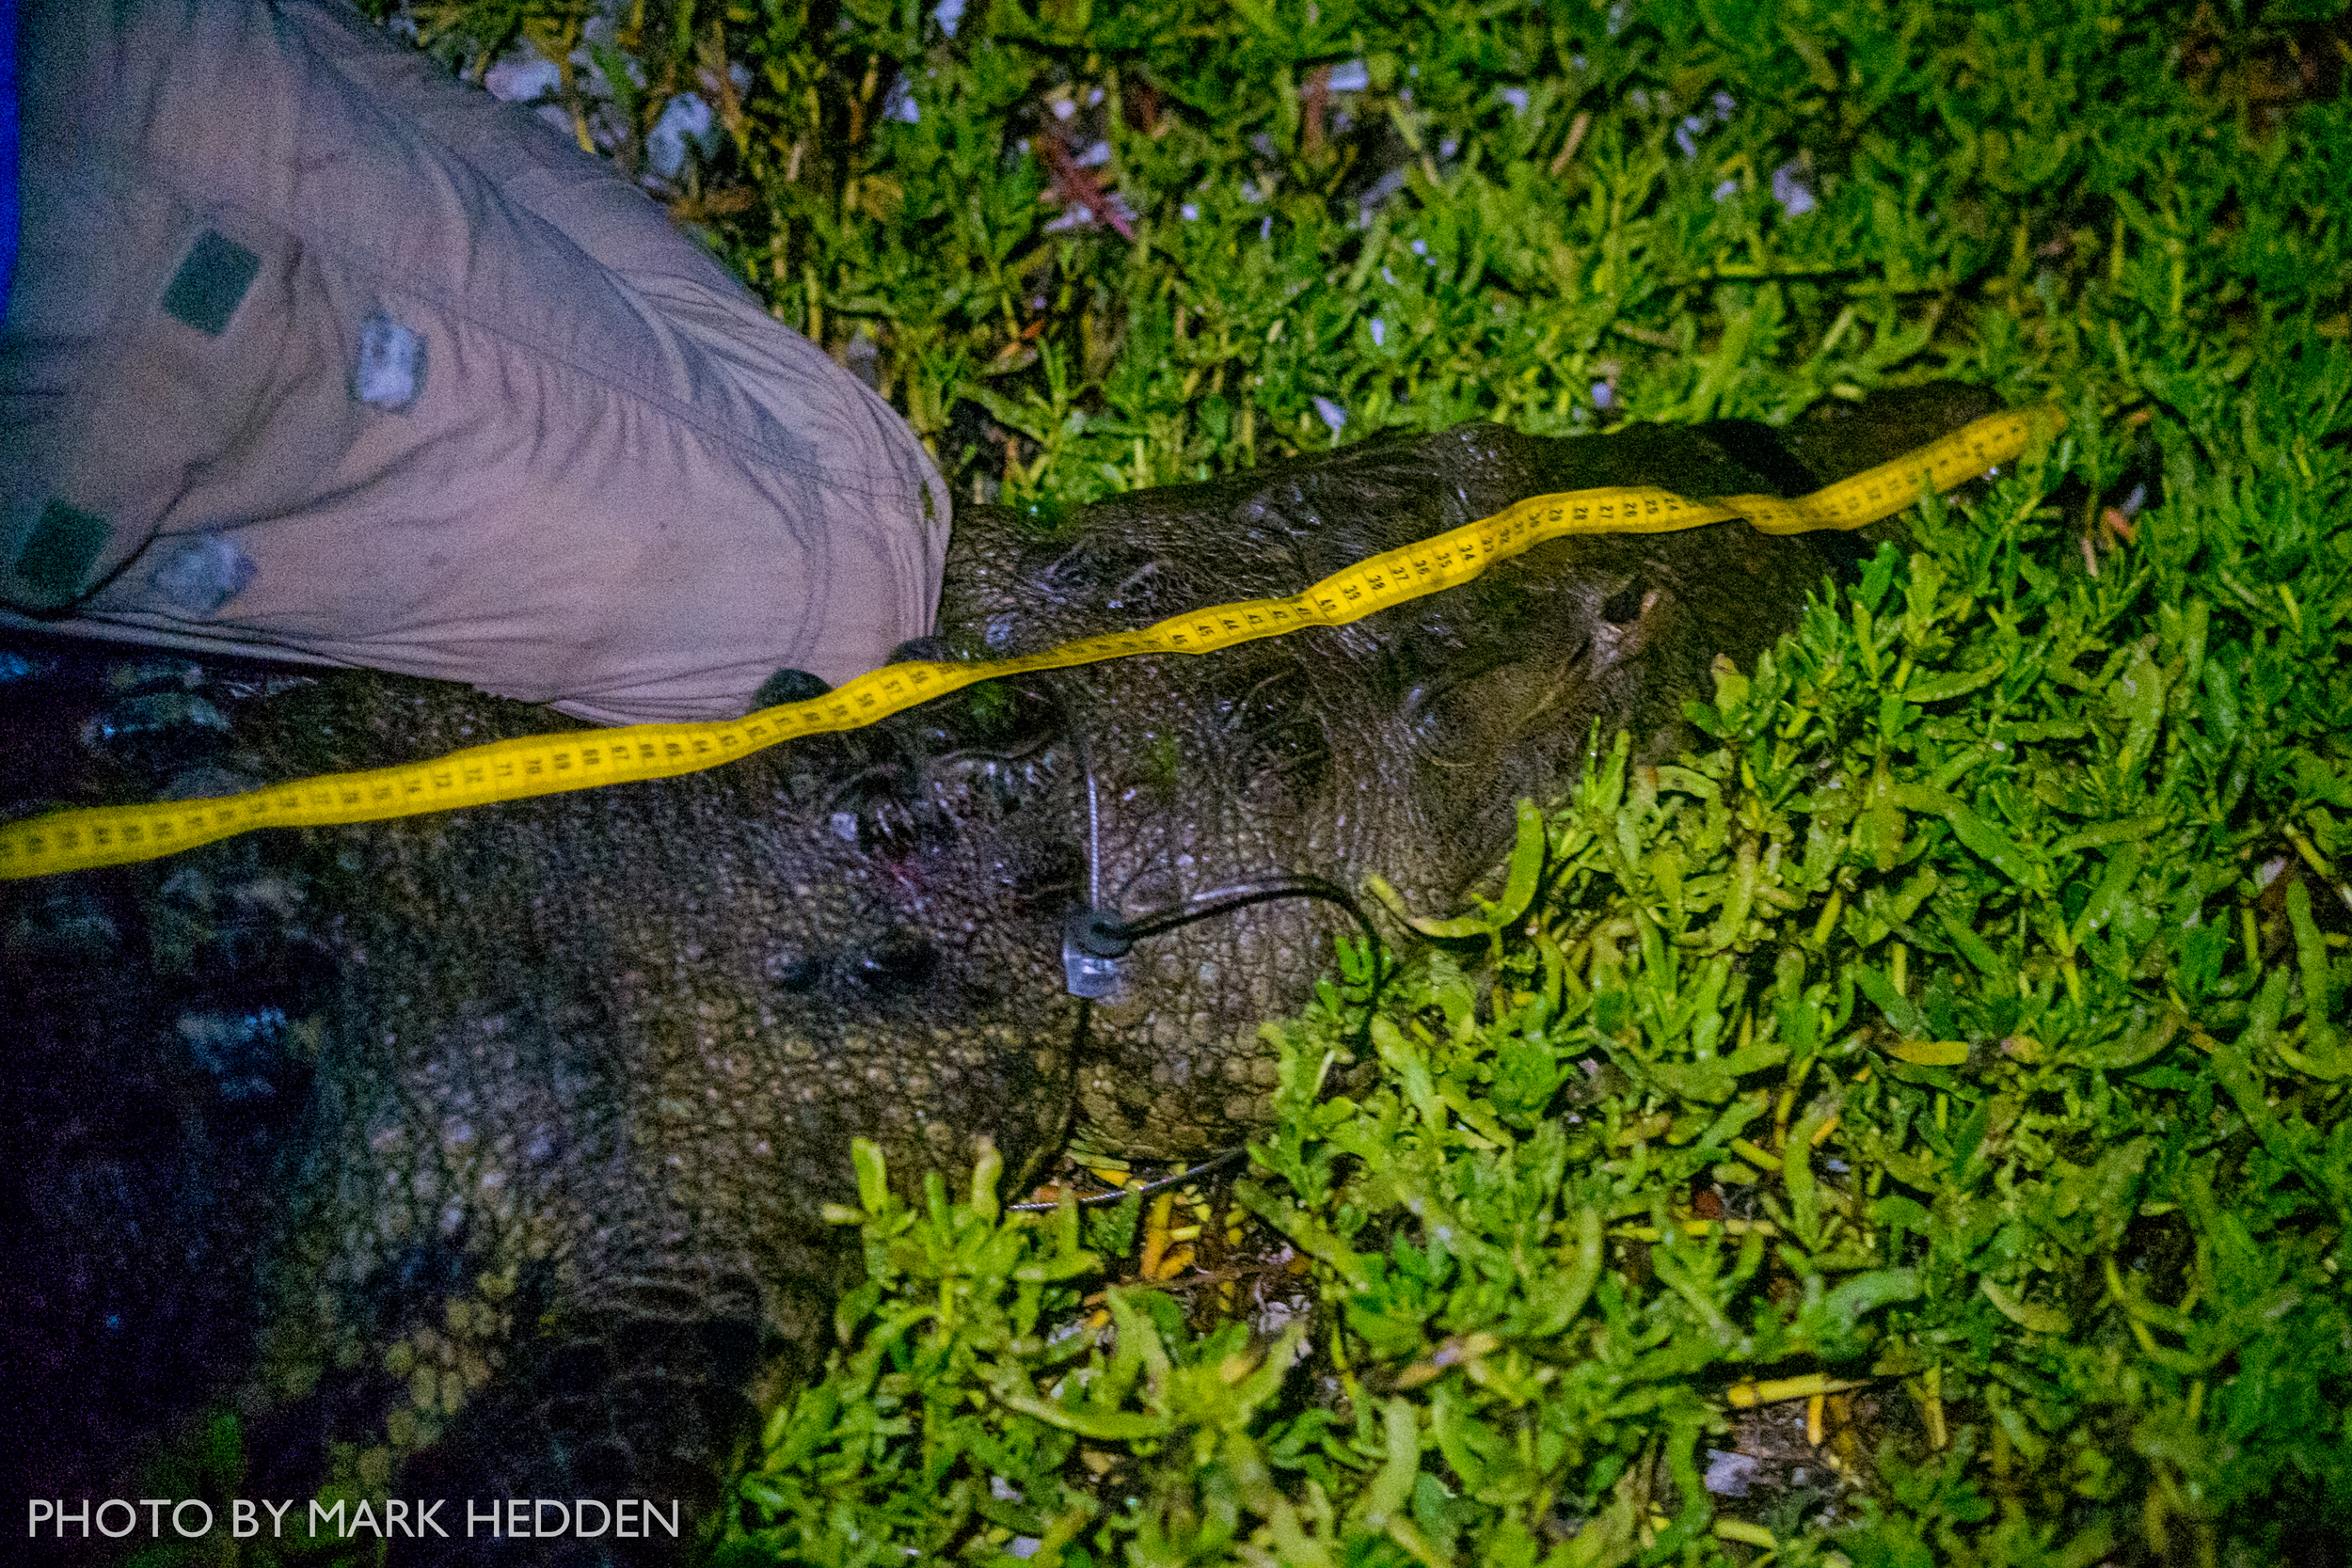 Croc (4 of 7)